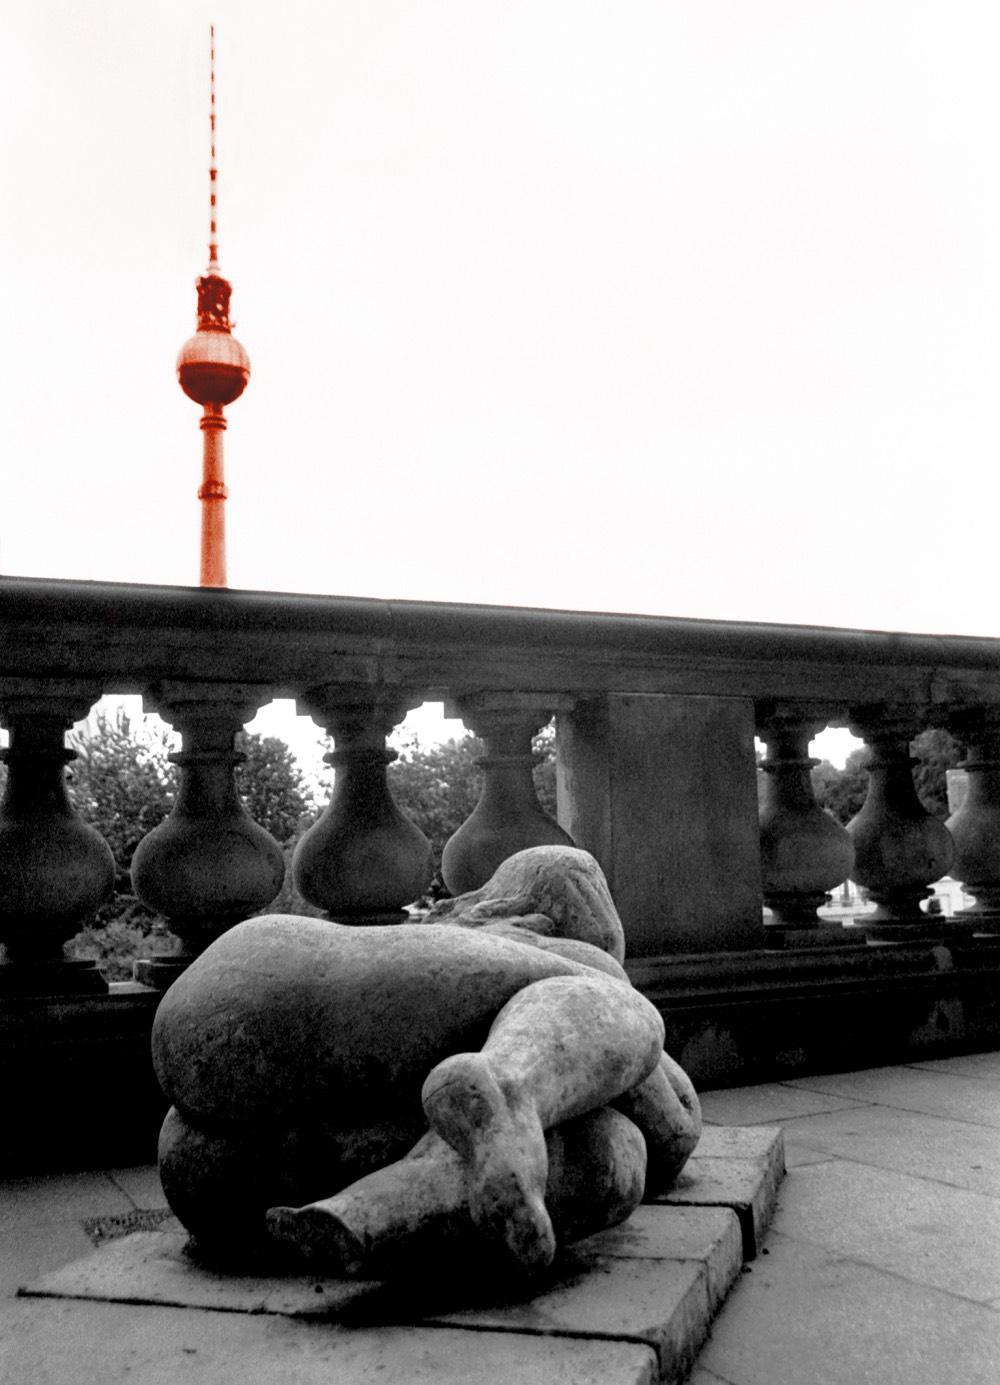 fotografka-zuzana-richter-praha-berlin-4